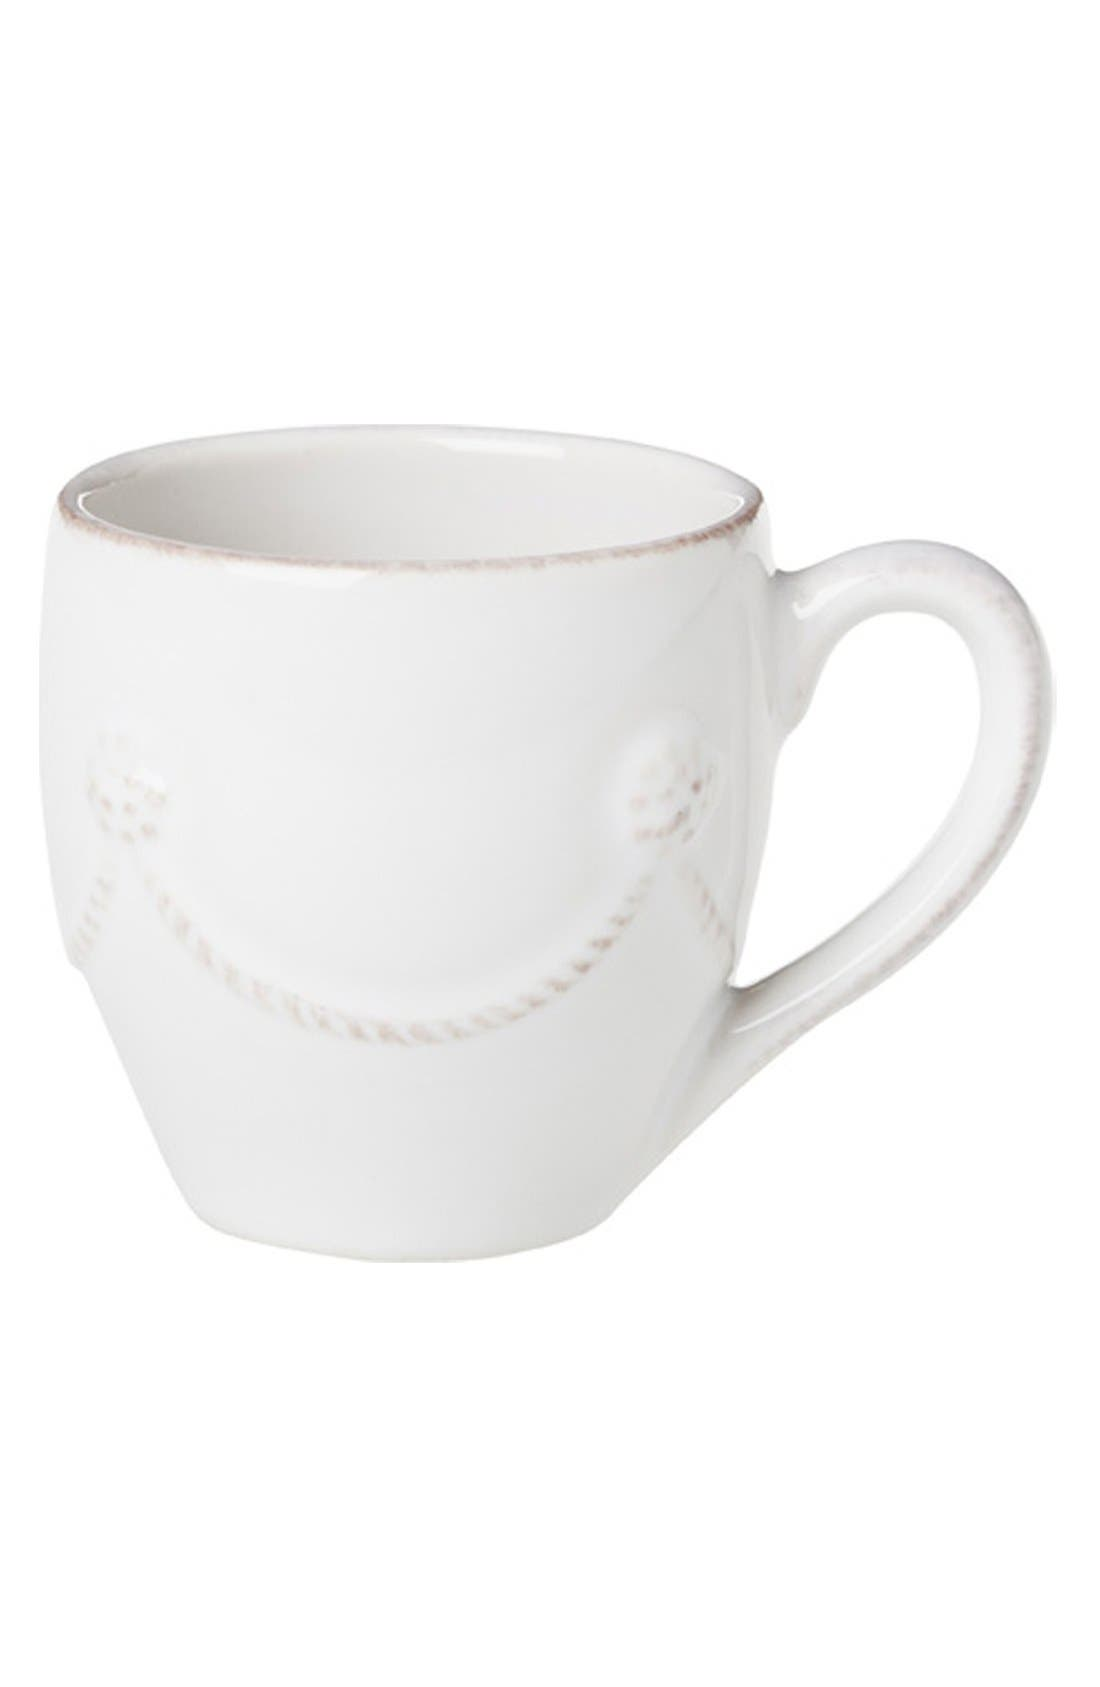 JULISKA 'Berry and Thread' Ceramic Demitasse Coffee Mug